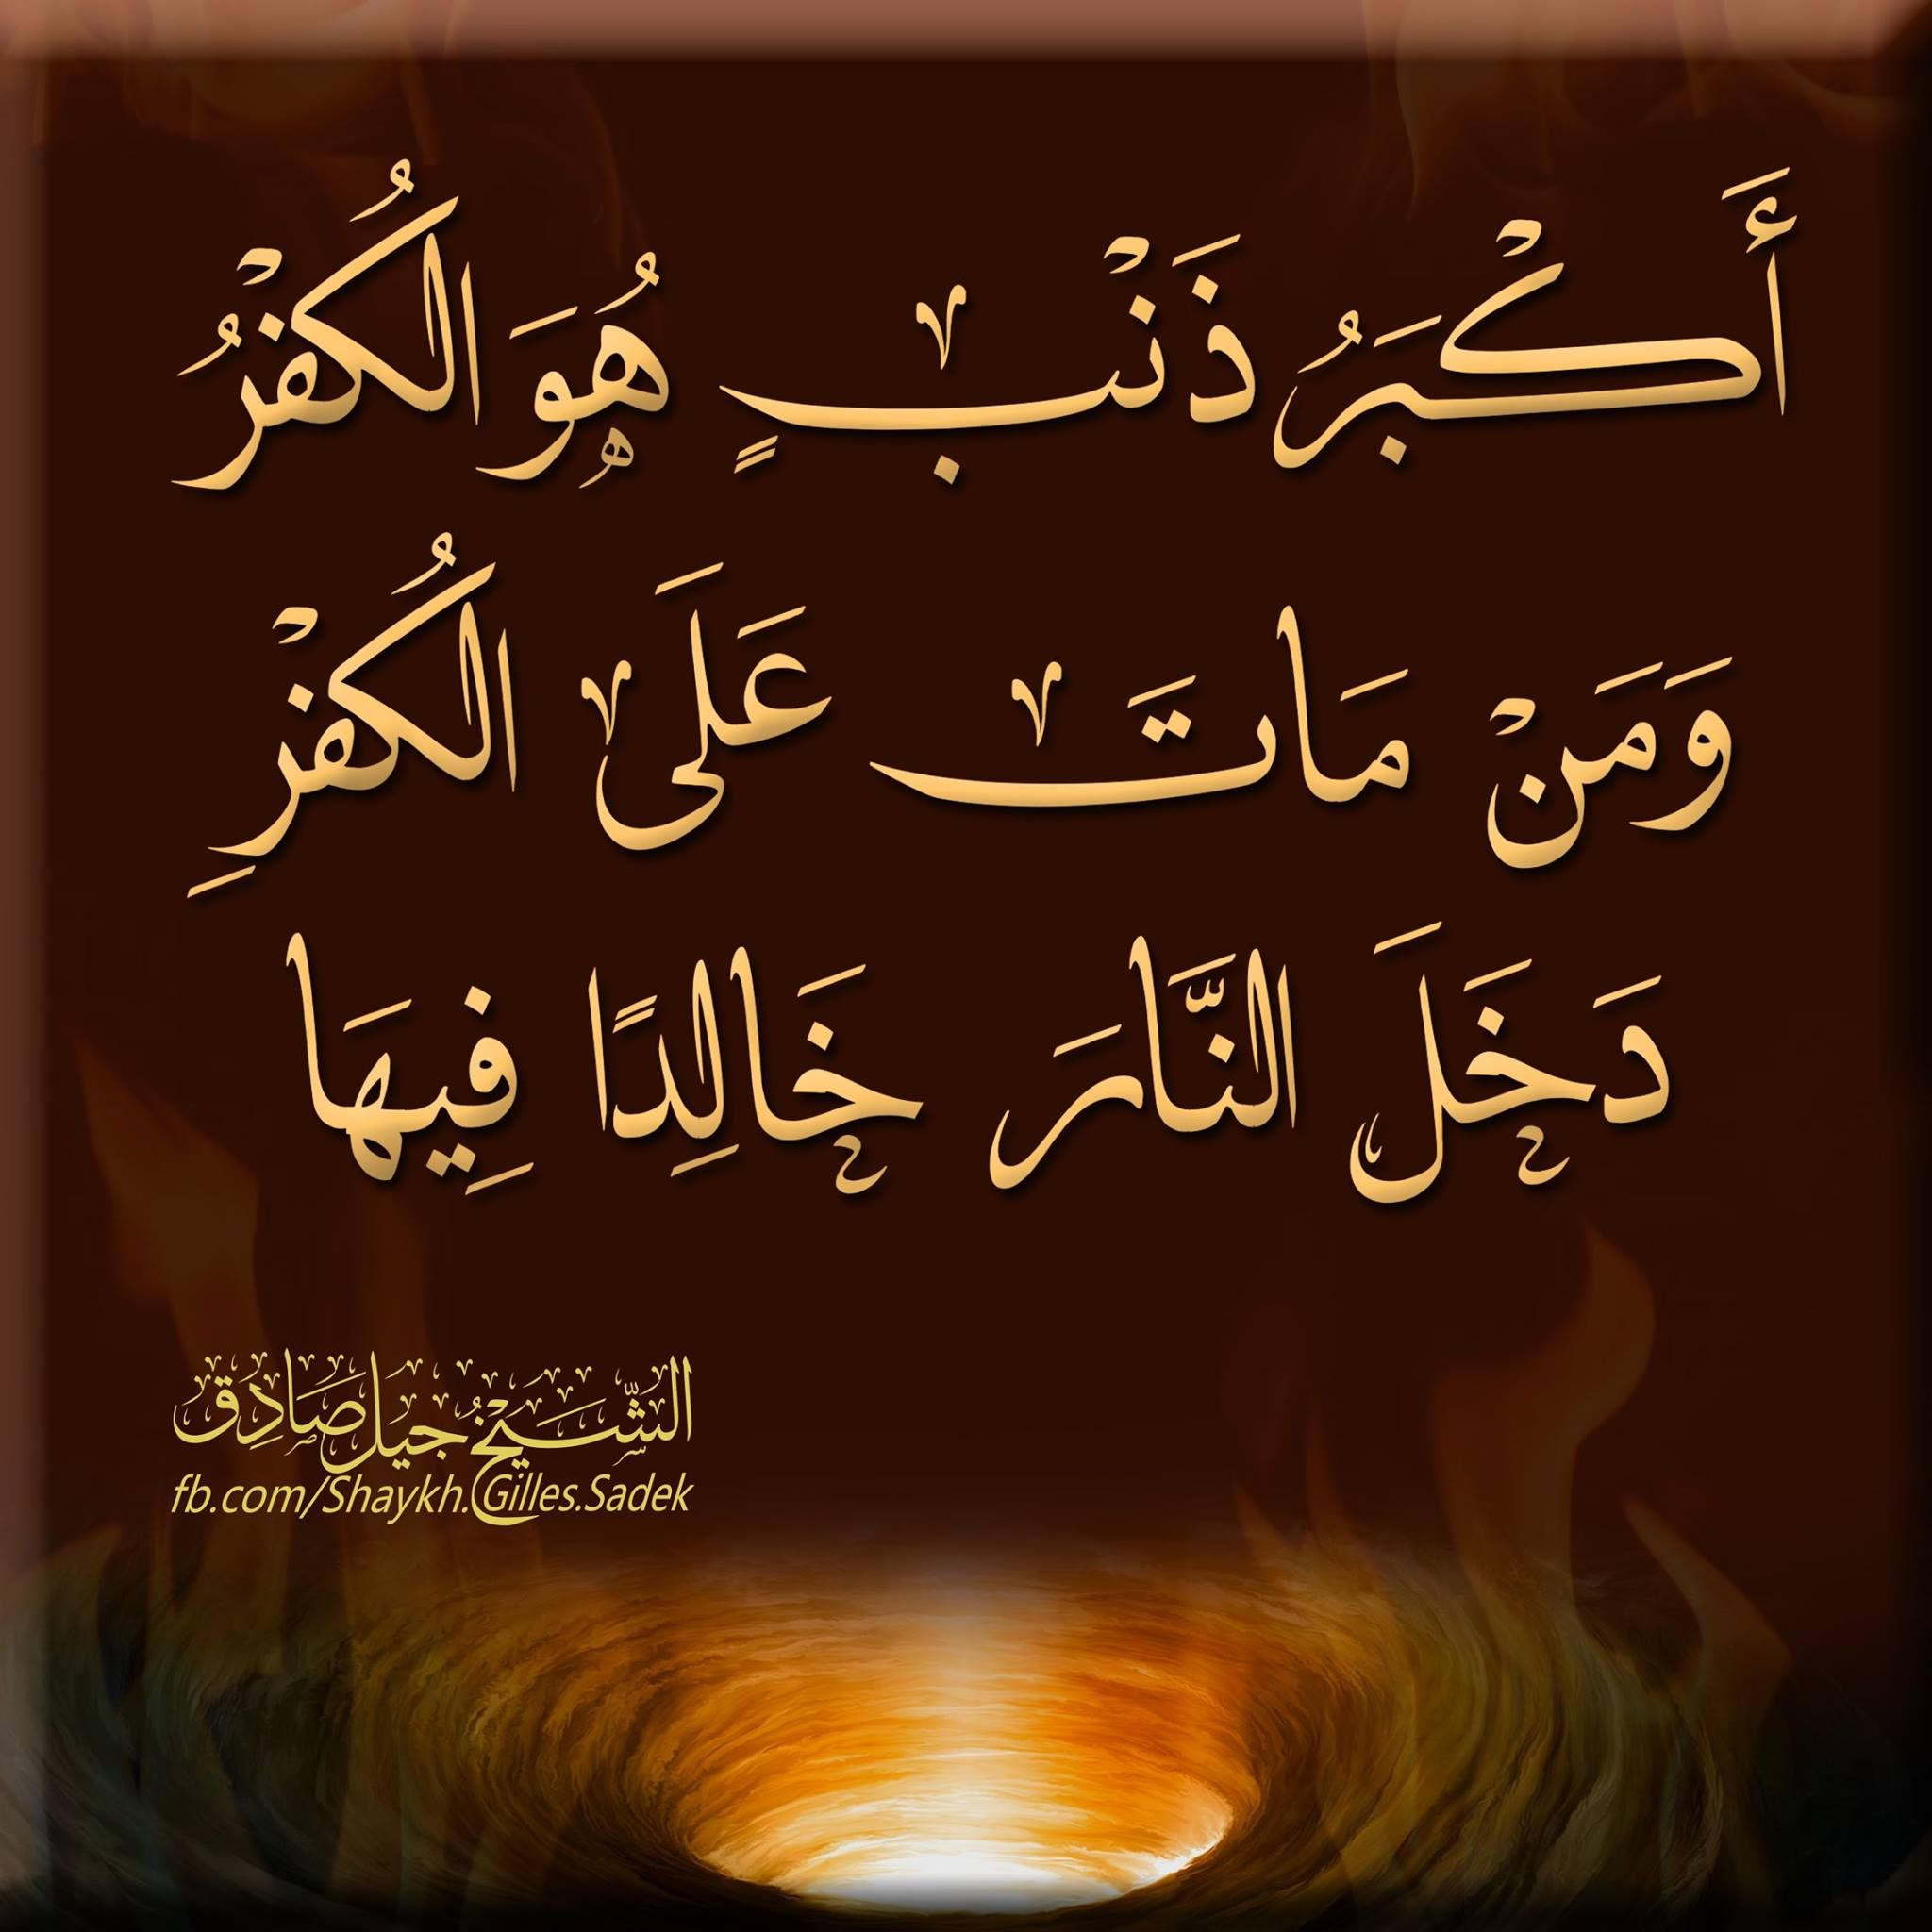 Fb Com Shaykh Gilles Sadek Whatsapp 15148244550 Twitter Shaykhgilles Instagram Shaykhgilles Telegram Shaykh Gilles Sadek Http Islamic Art Instagram Photo